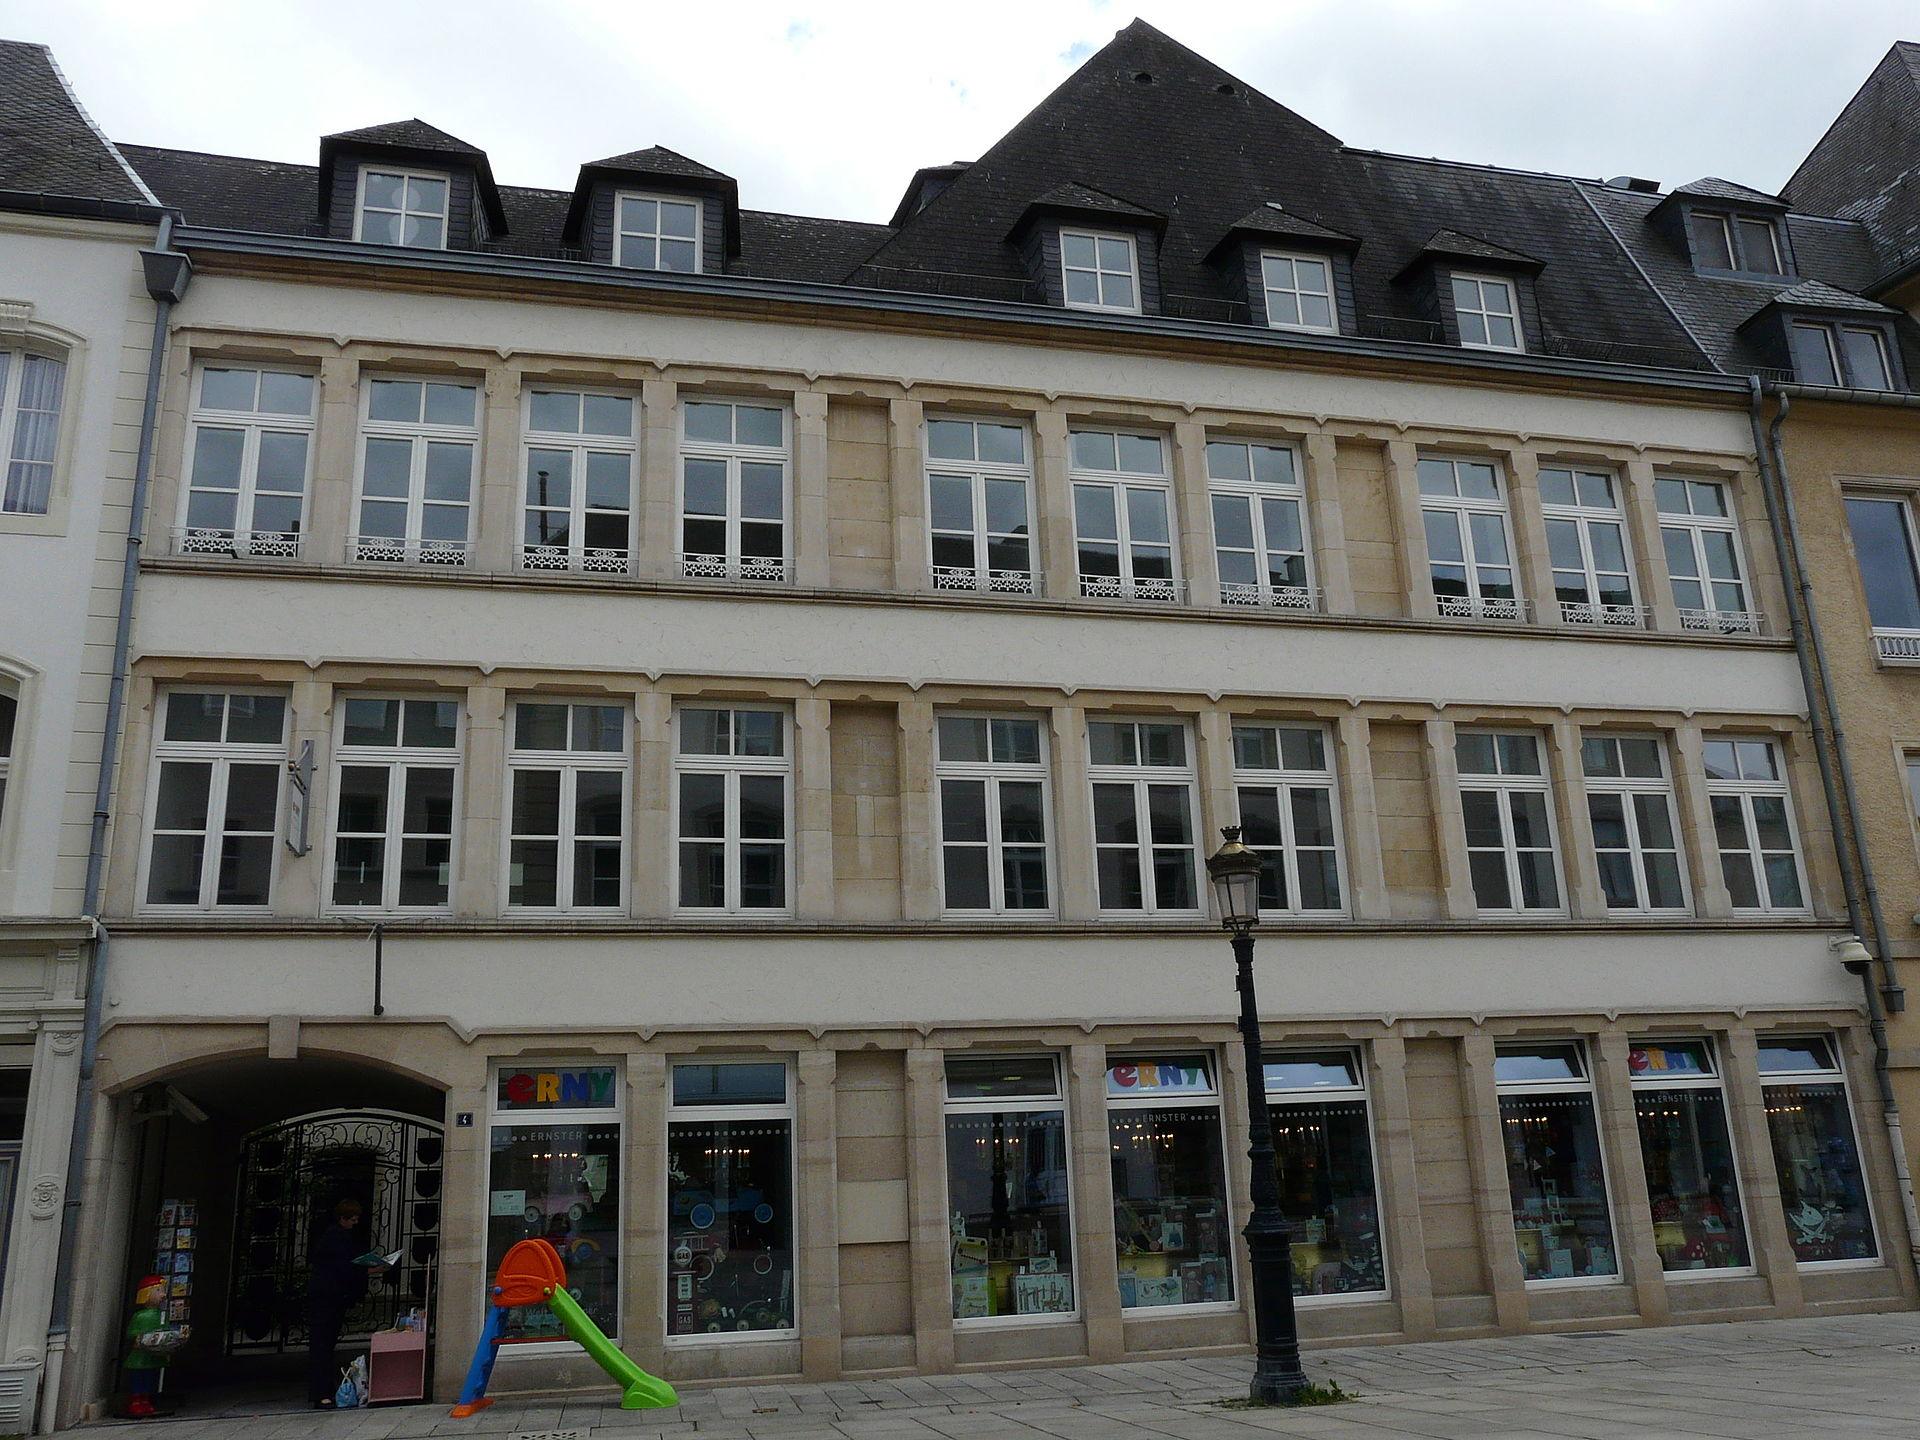 Maison de raville wikipedia for Maison moderne luxembourg wikipedia